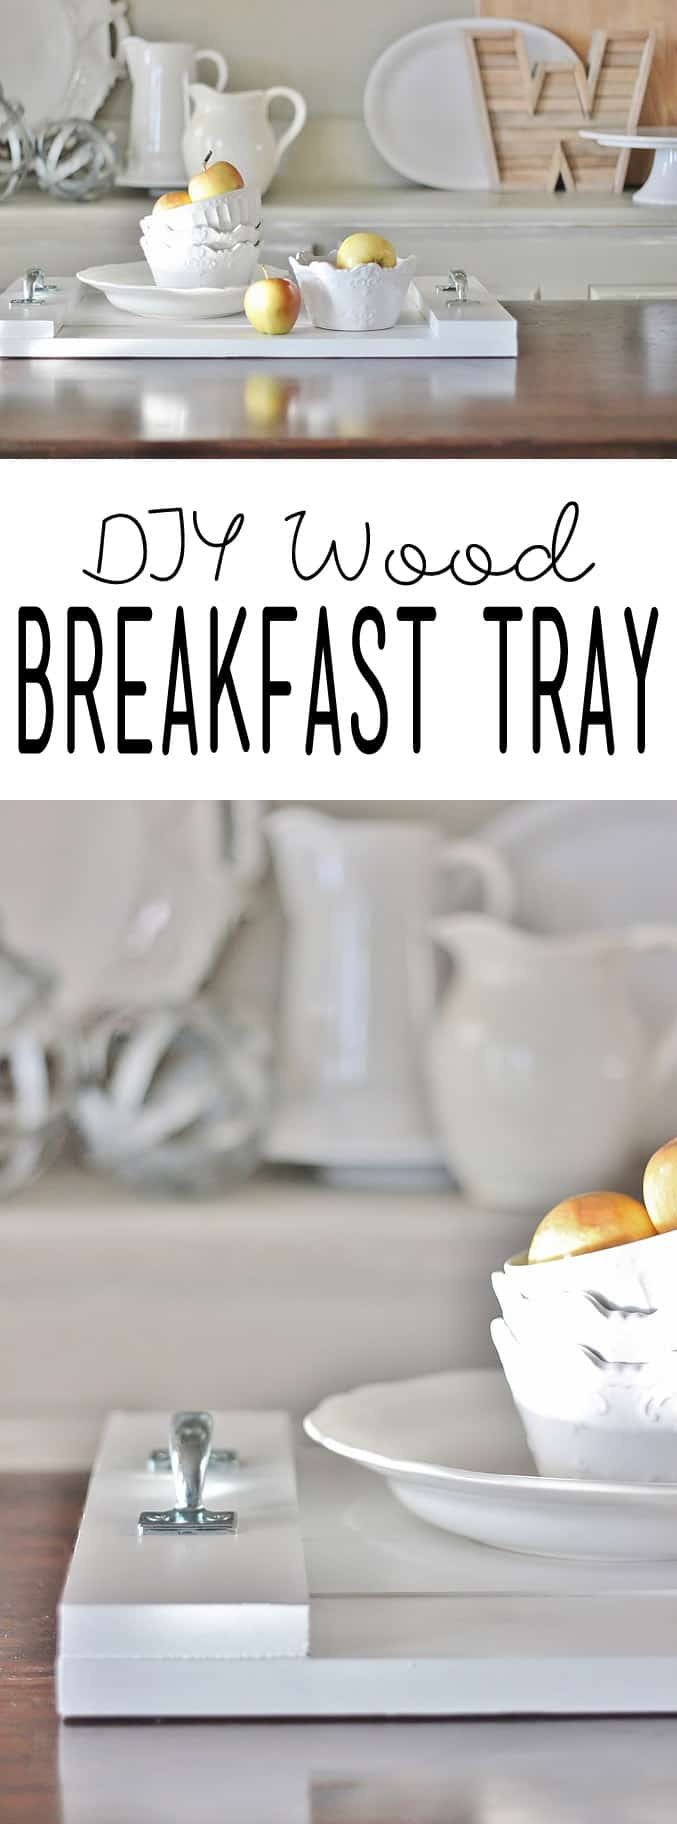 DIY Wood Breakfast Tray Instructions